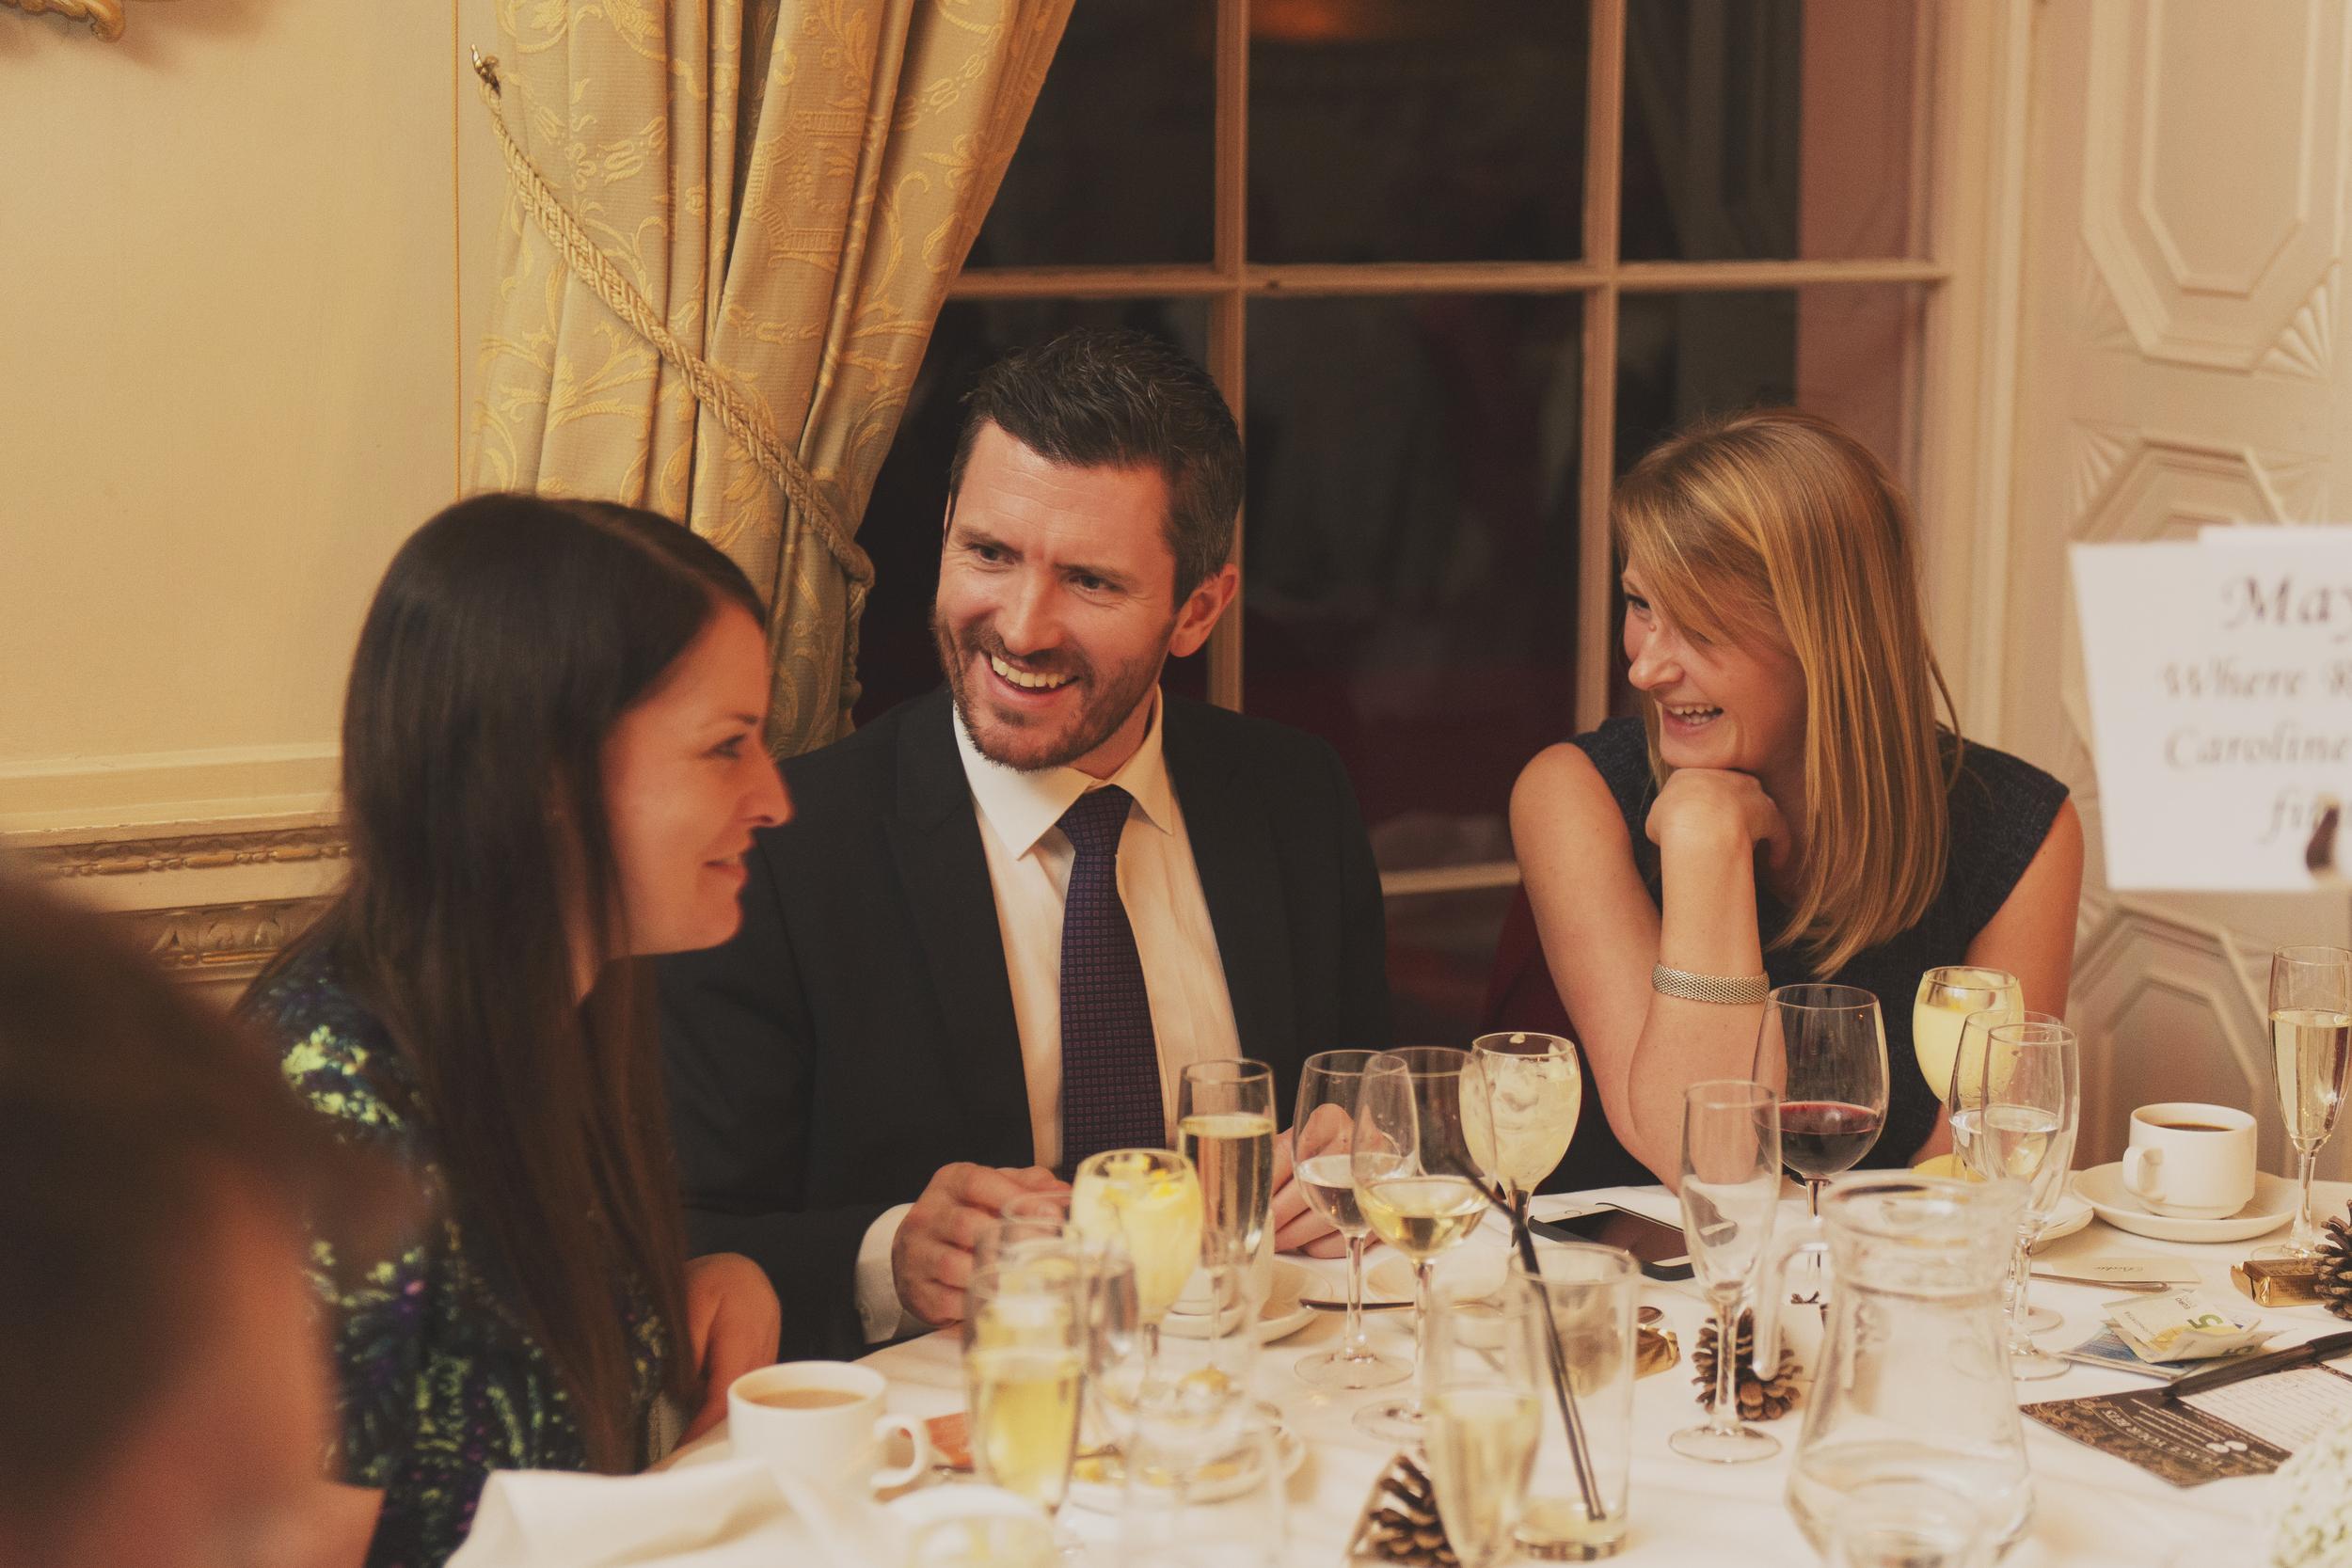 Carton_House_Wedding_Photography_Maynooth_Ireland_082.jpg